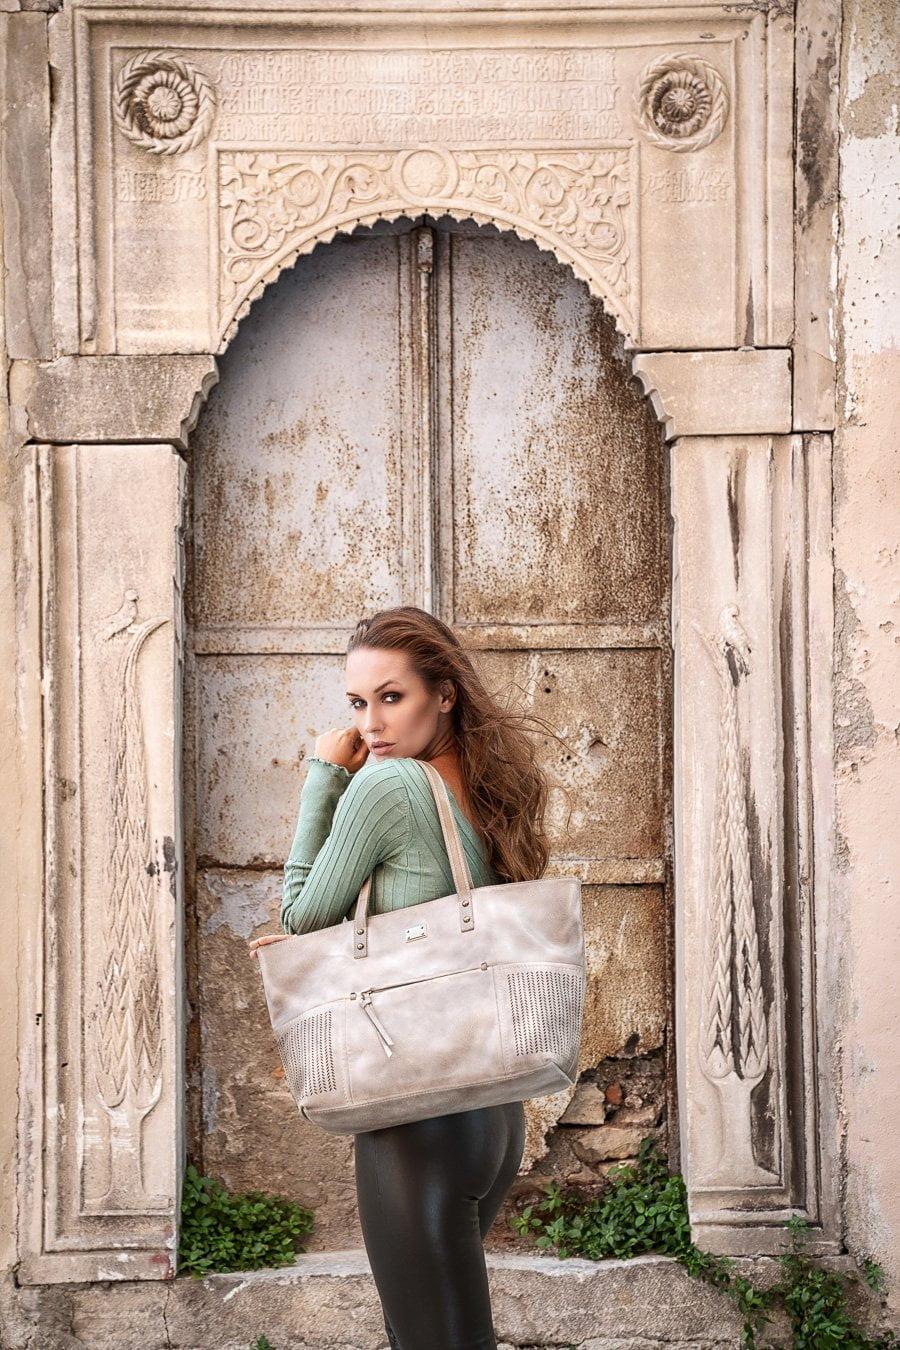 Moda Çekimi - Editorial - Beauty moda tekstil burakbulutfotografatolyesi 12